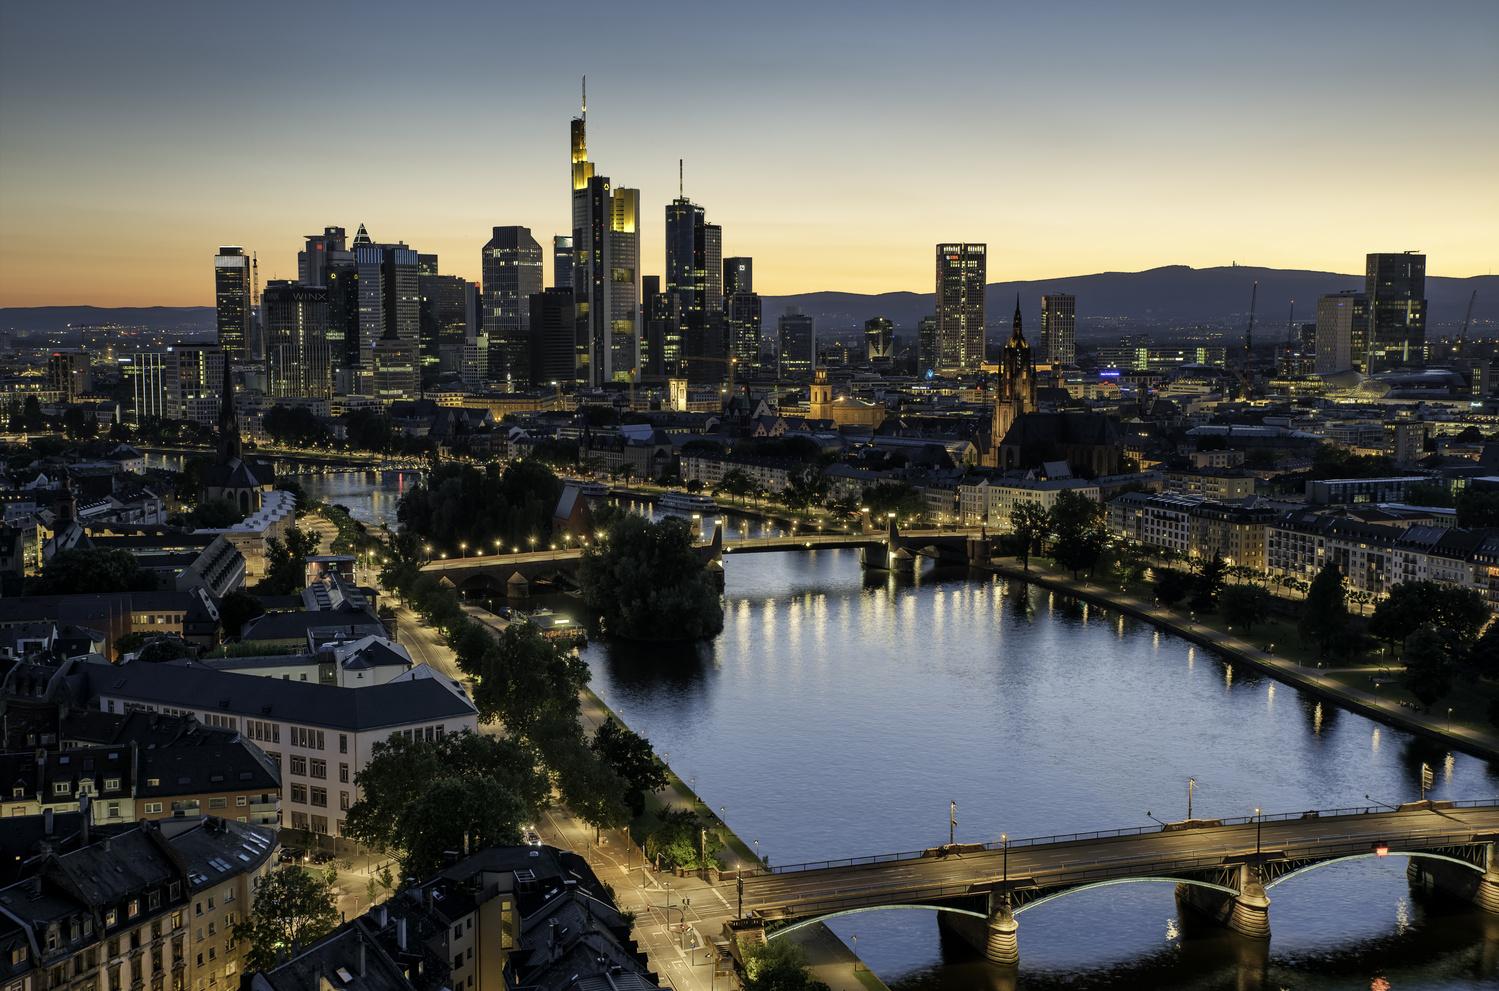 Frankfurt Sunset by Will Reynolds